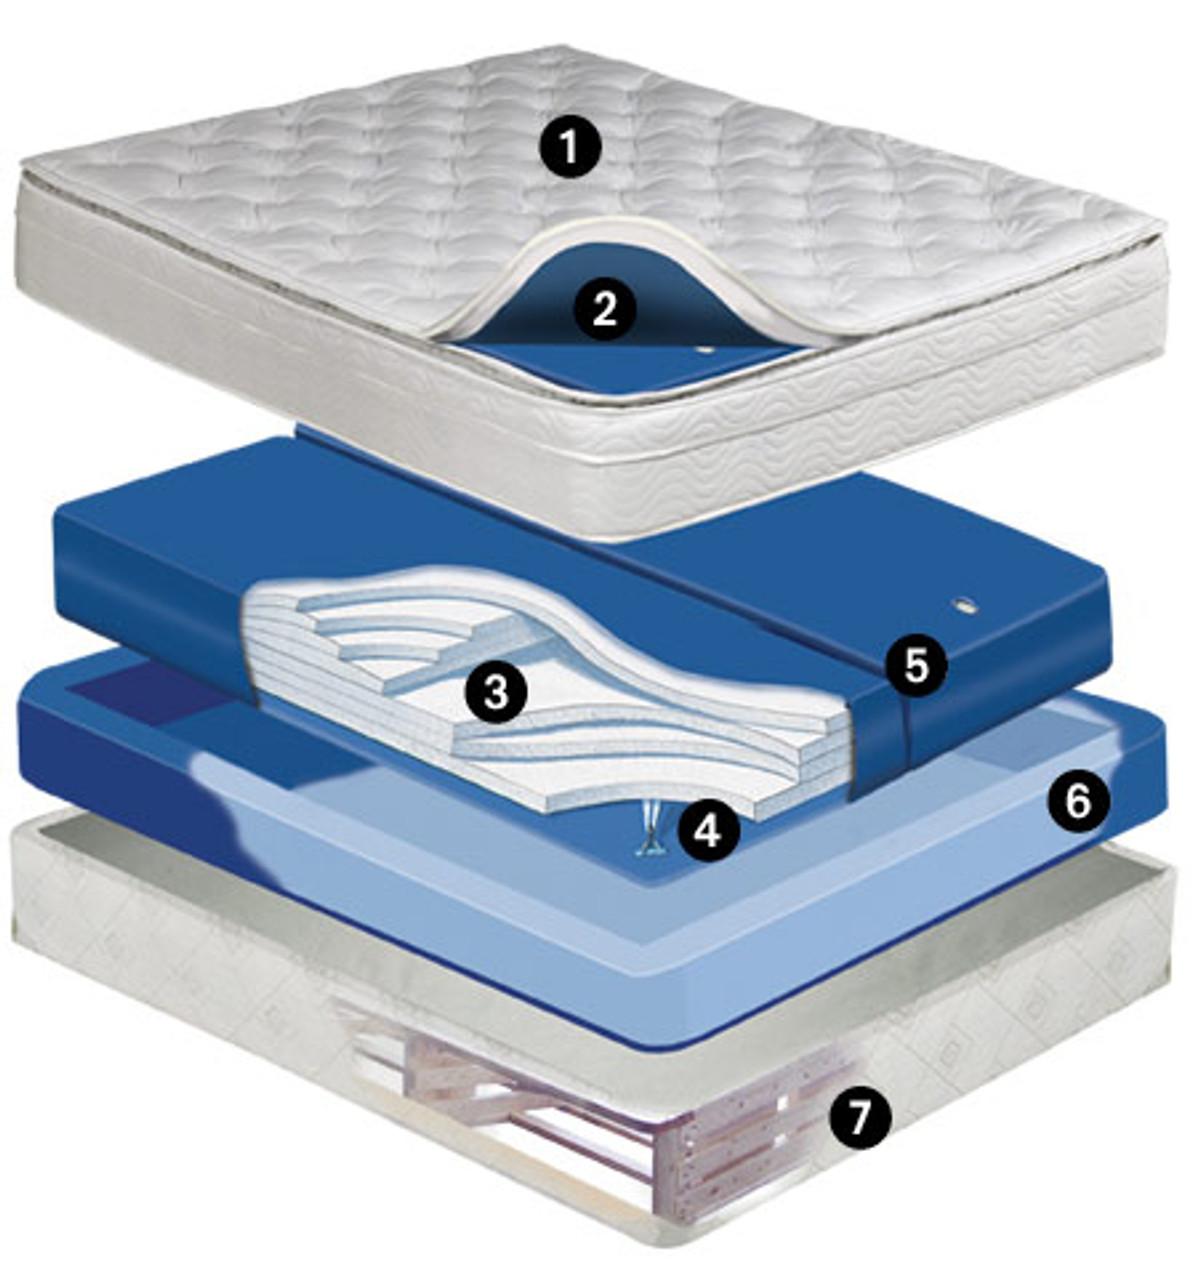 Meridian 10 inch deep fill softside waterbed mattress Dual Chamber Waveless Mattress